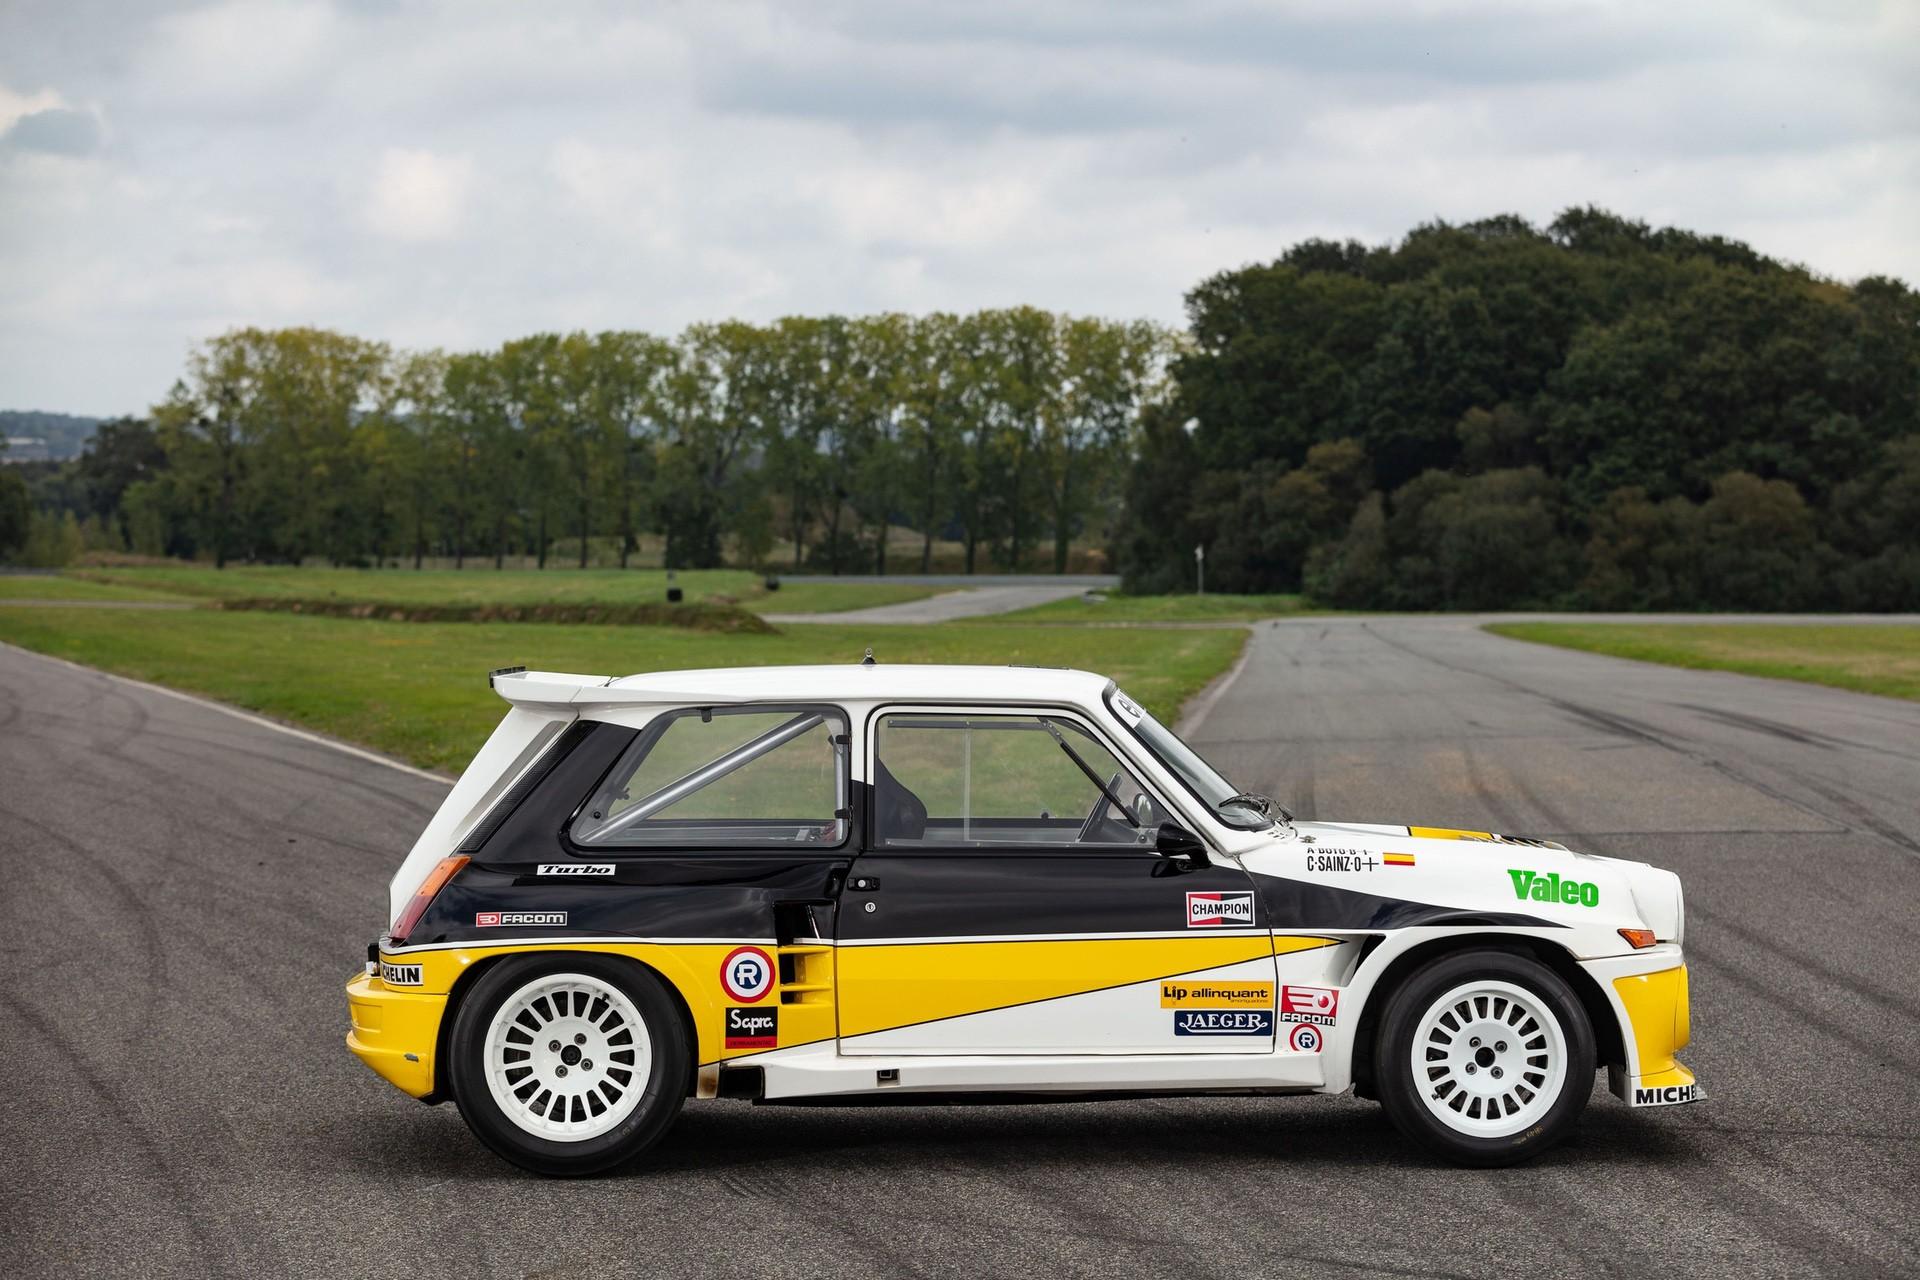 Renault_R5_Maxi_Turbo_ex-Carlos_Sainz-0046